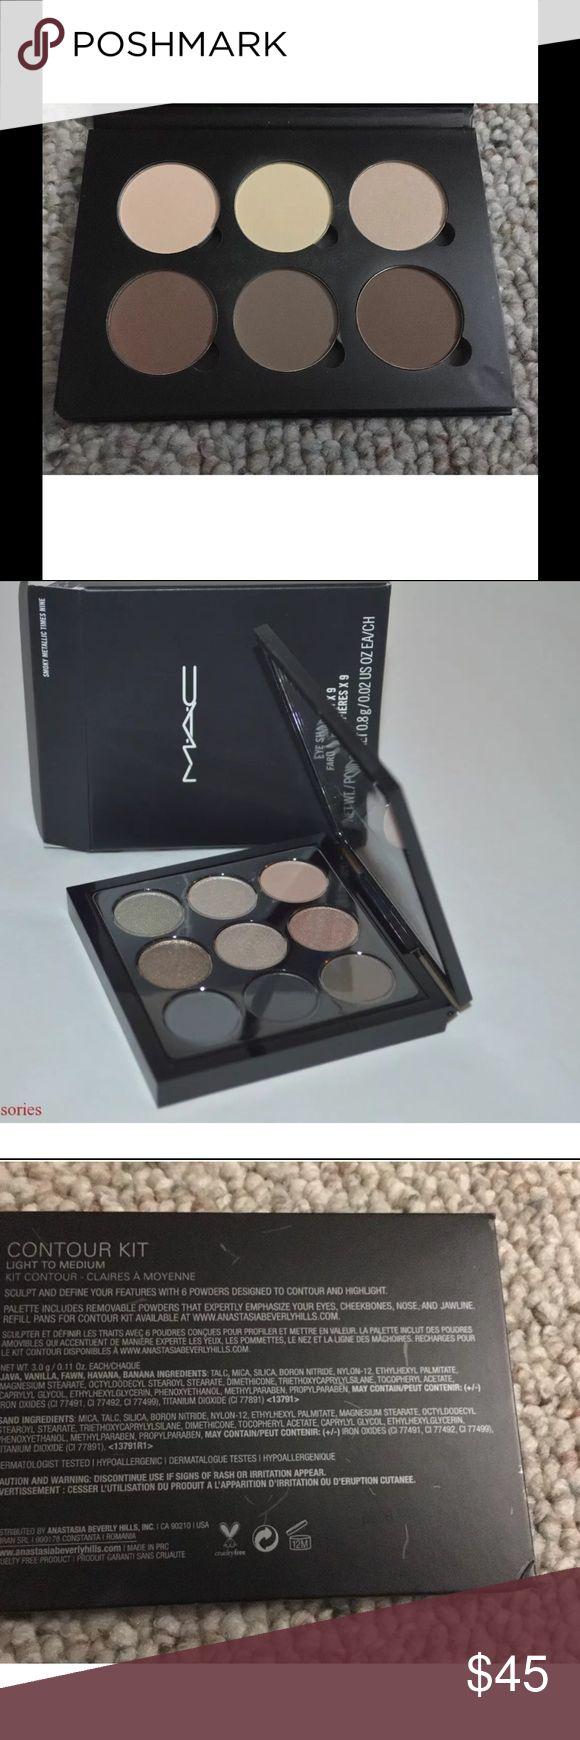 Eyeshadow Palette X 9 Colors NIB Authentic MAC Eye Shadow X9 - Smoky Metallic Times Nine   Filament (L) Carbon (M) Simple Sensation (M) Give Me Fire (L) Spice Bar (S) Richy Rich (L) Black Factor (M) By The Silver Moon (VXP) Petrol (S) MAC Cosmetics Makeup Eyeshadow